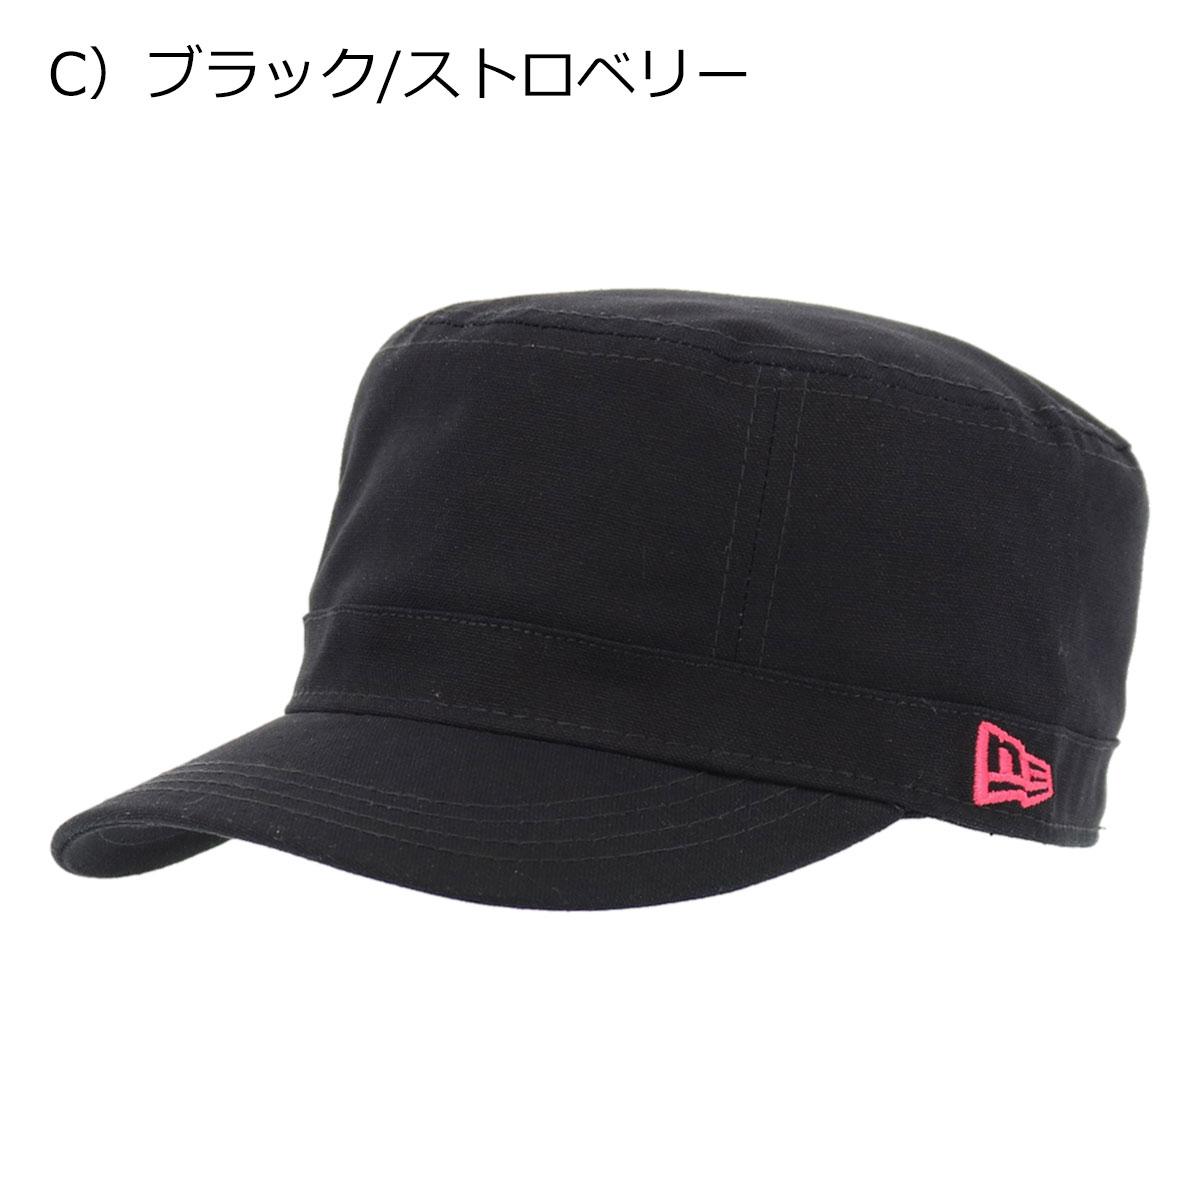 C)ブラック/ストロベリー